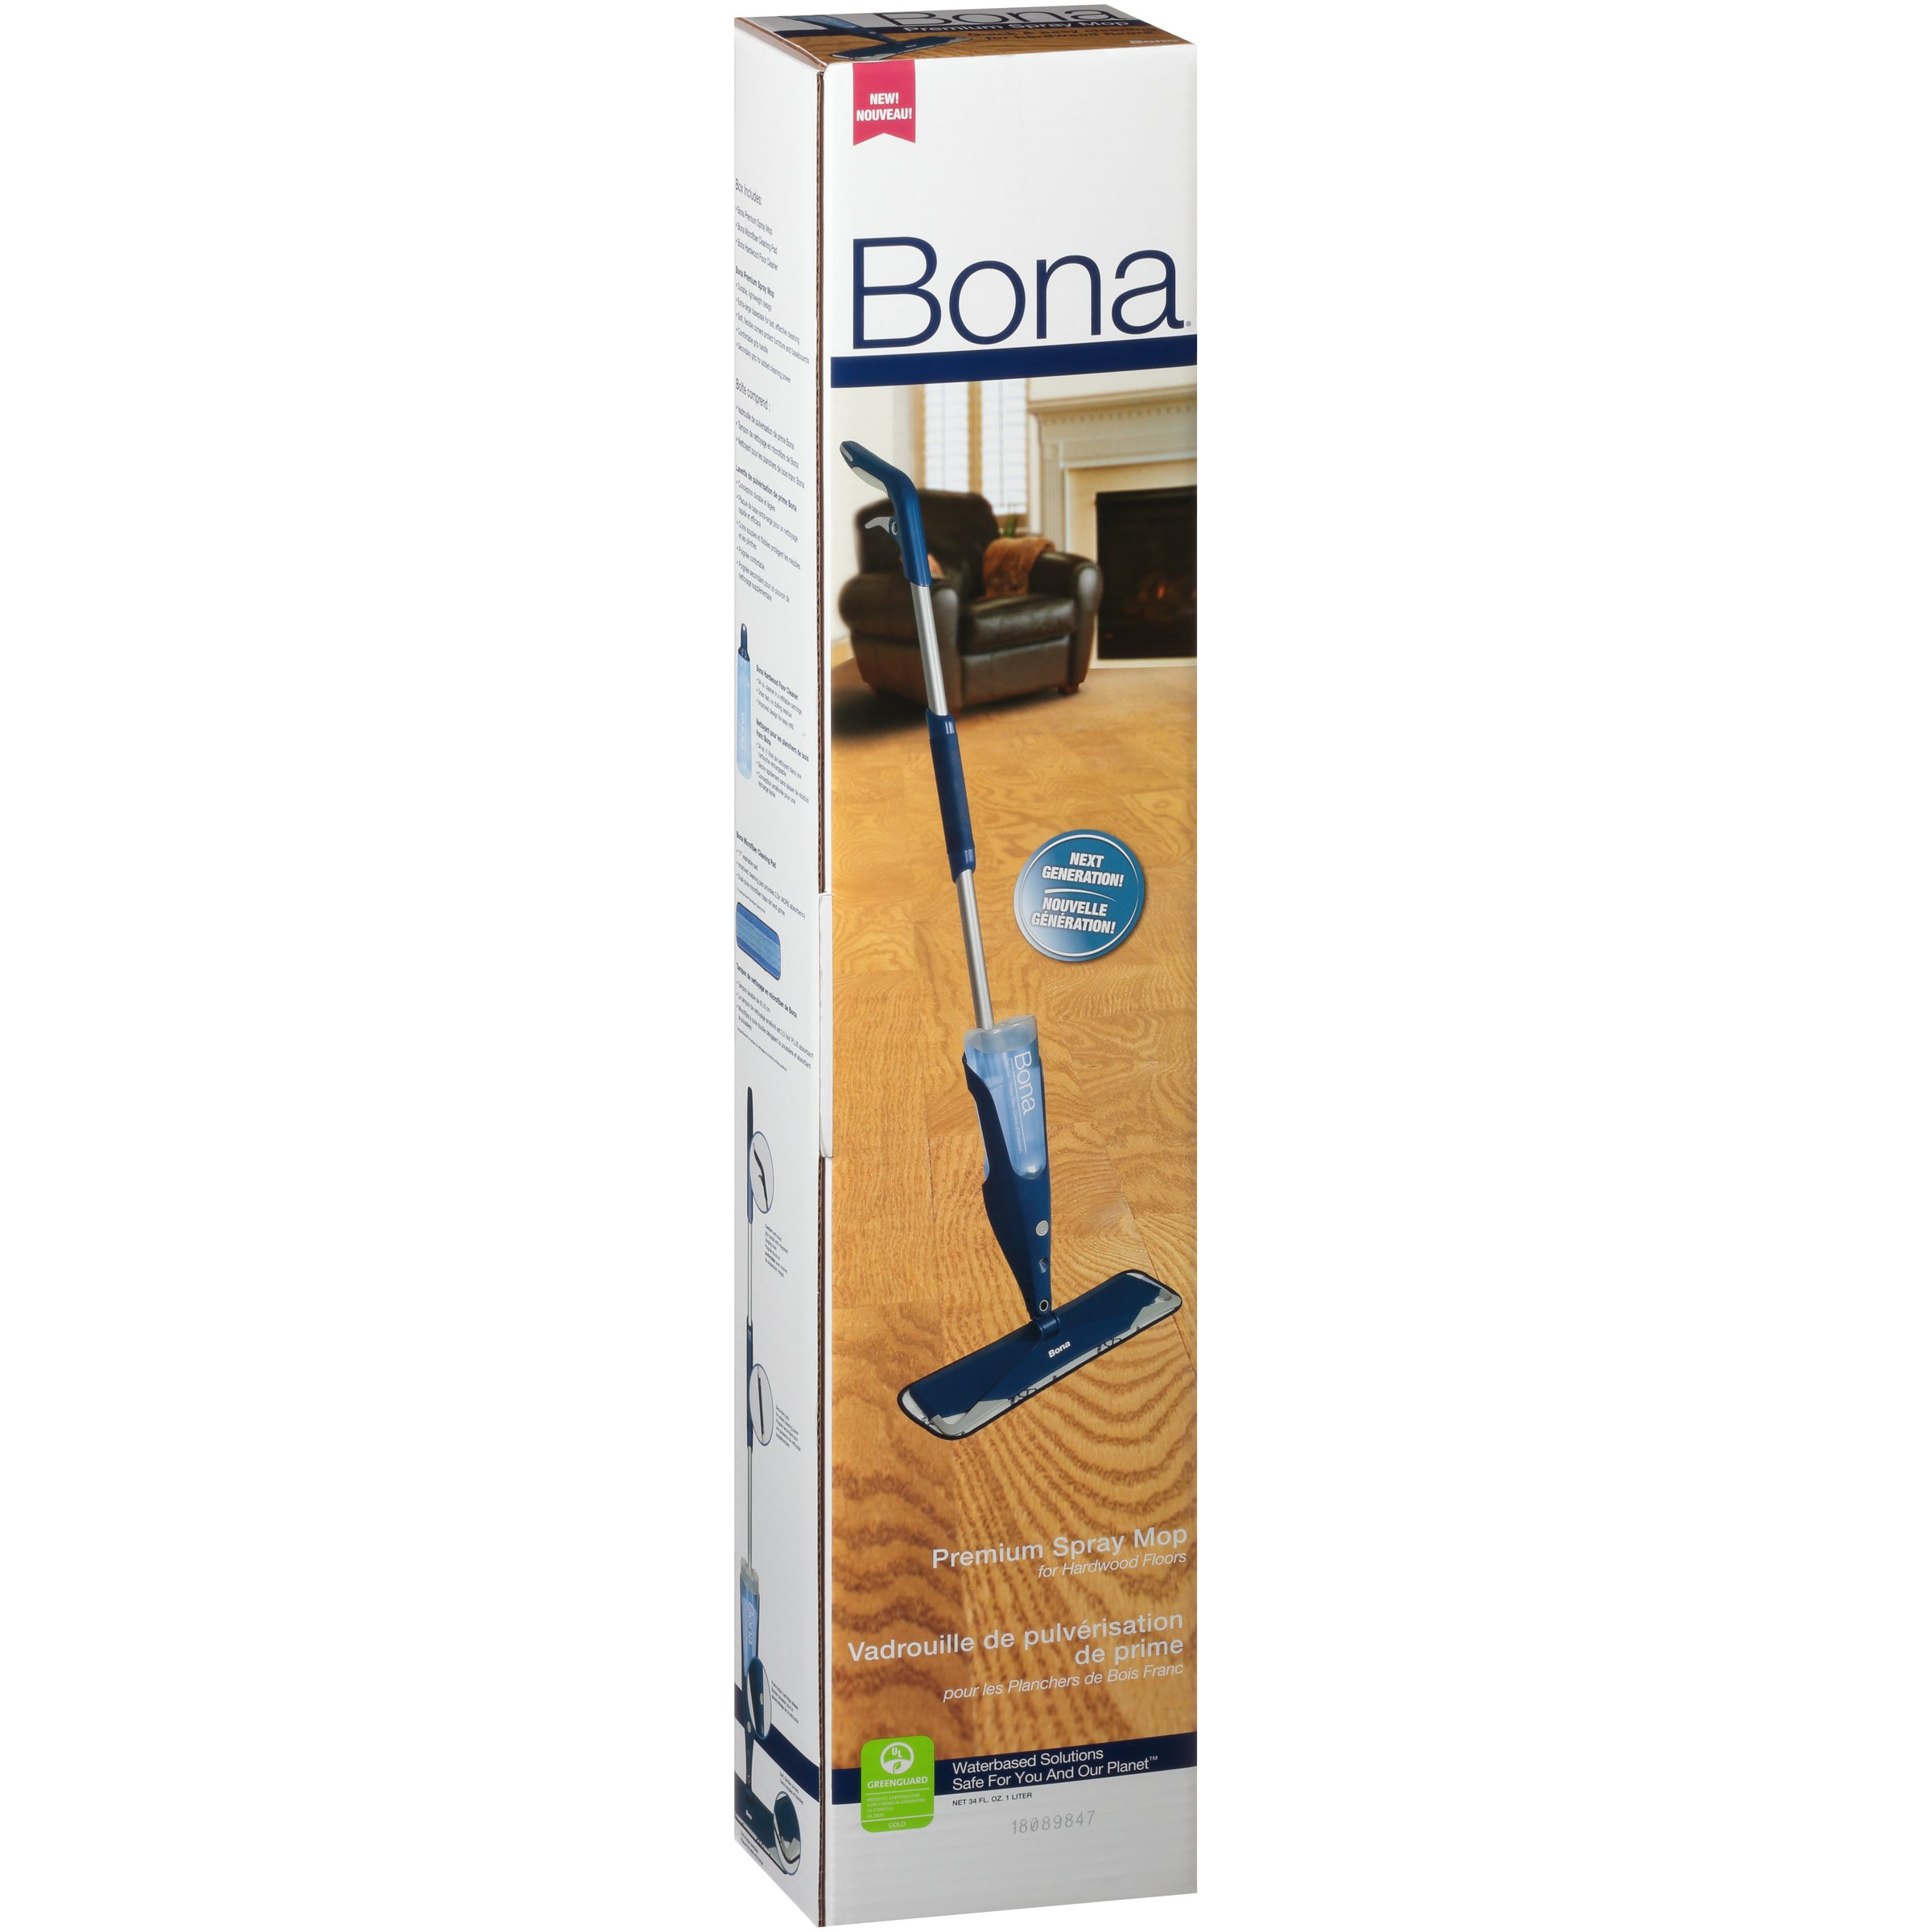 Bona Hardwood Floor Spray Mop Premium by Bona (Image #3)